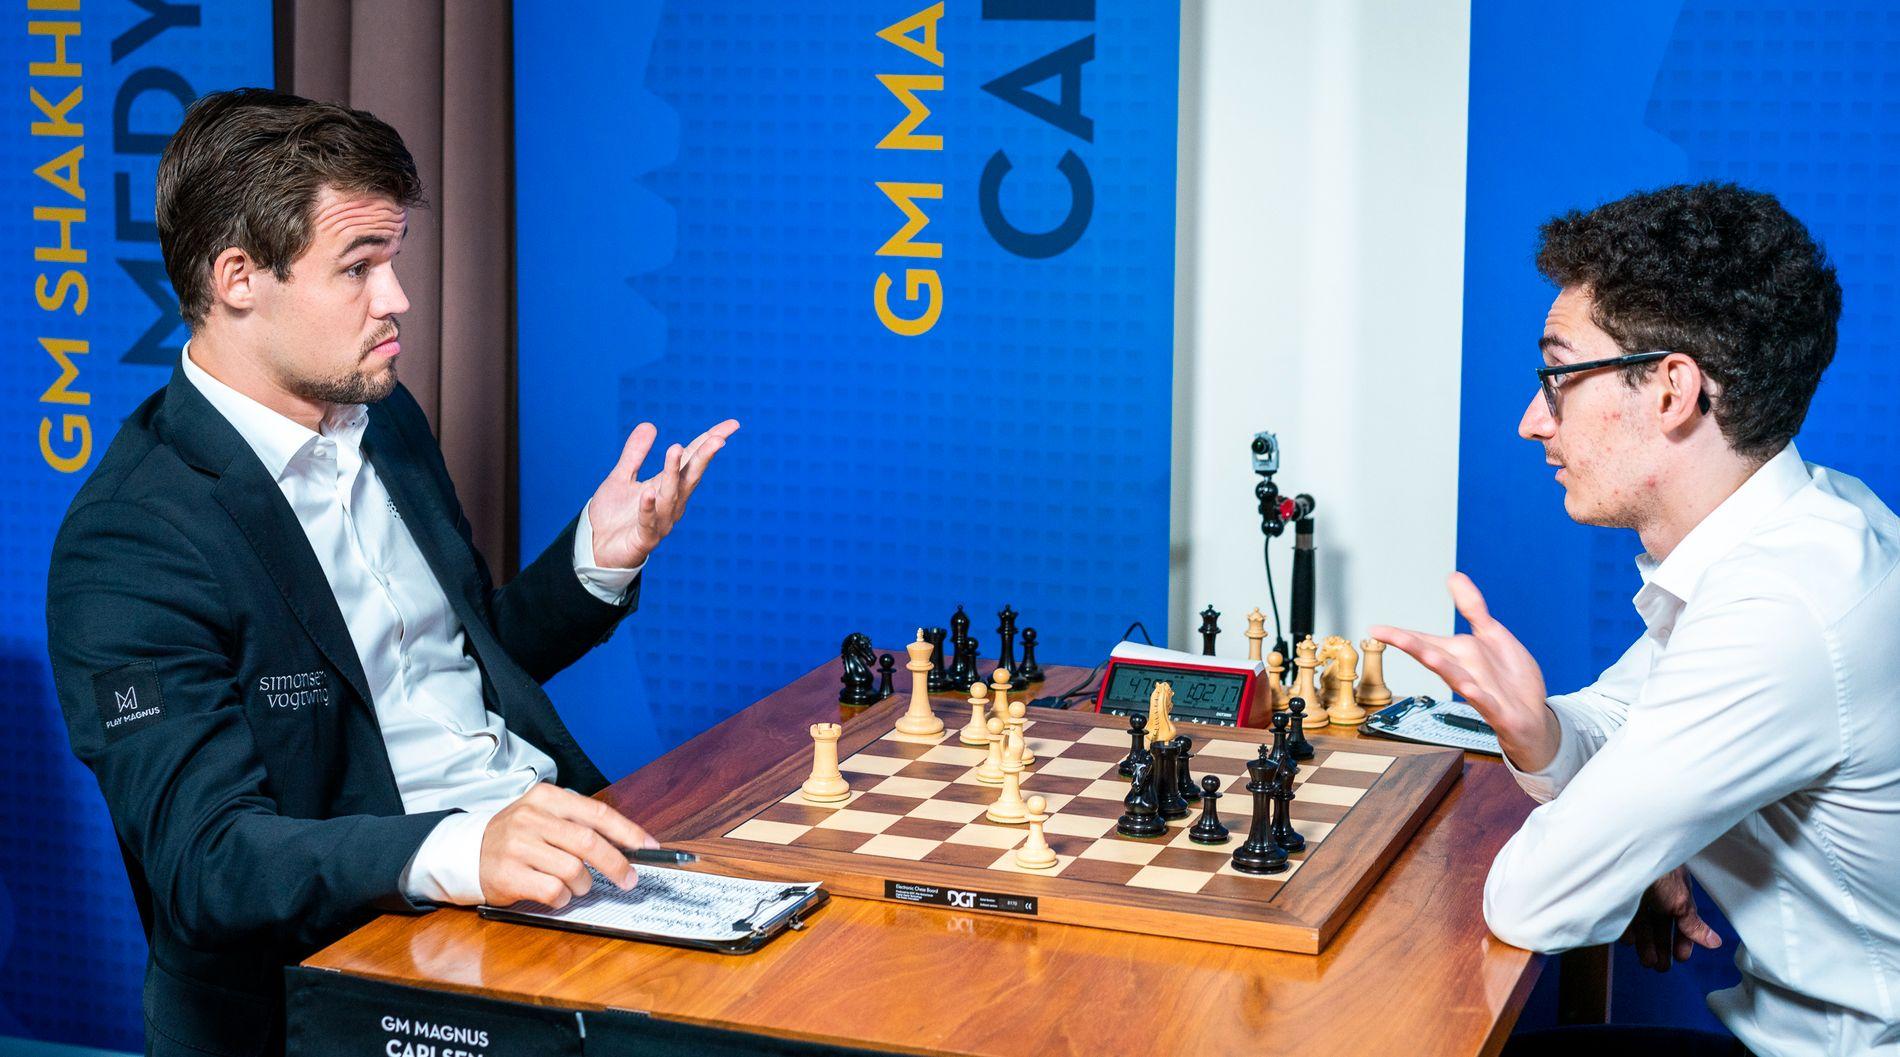 SISTE MØTE: Magnus Carlsen og Fabiano Caruana etter sitt parti i Sinquefield Cup sist helg.